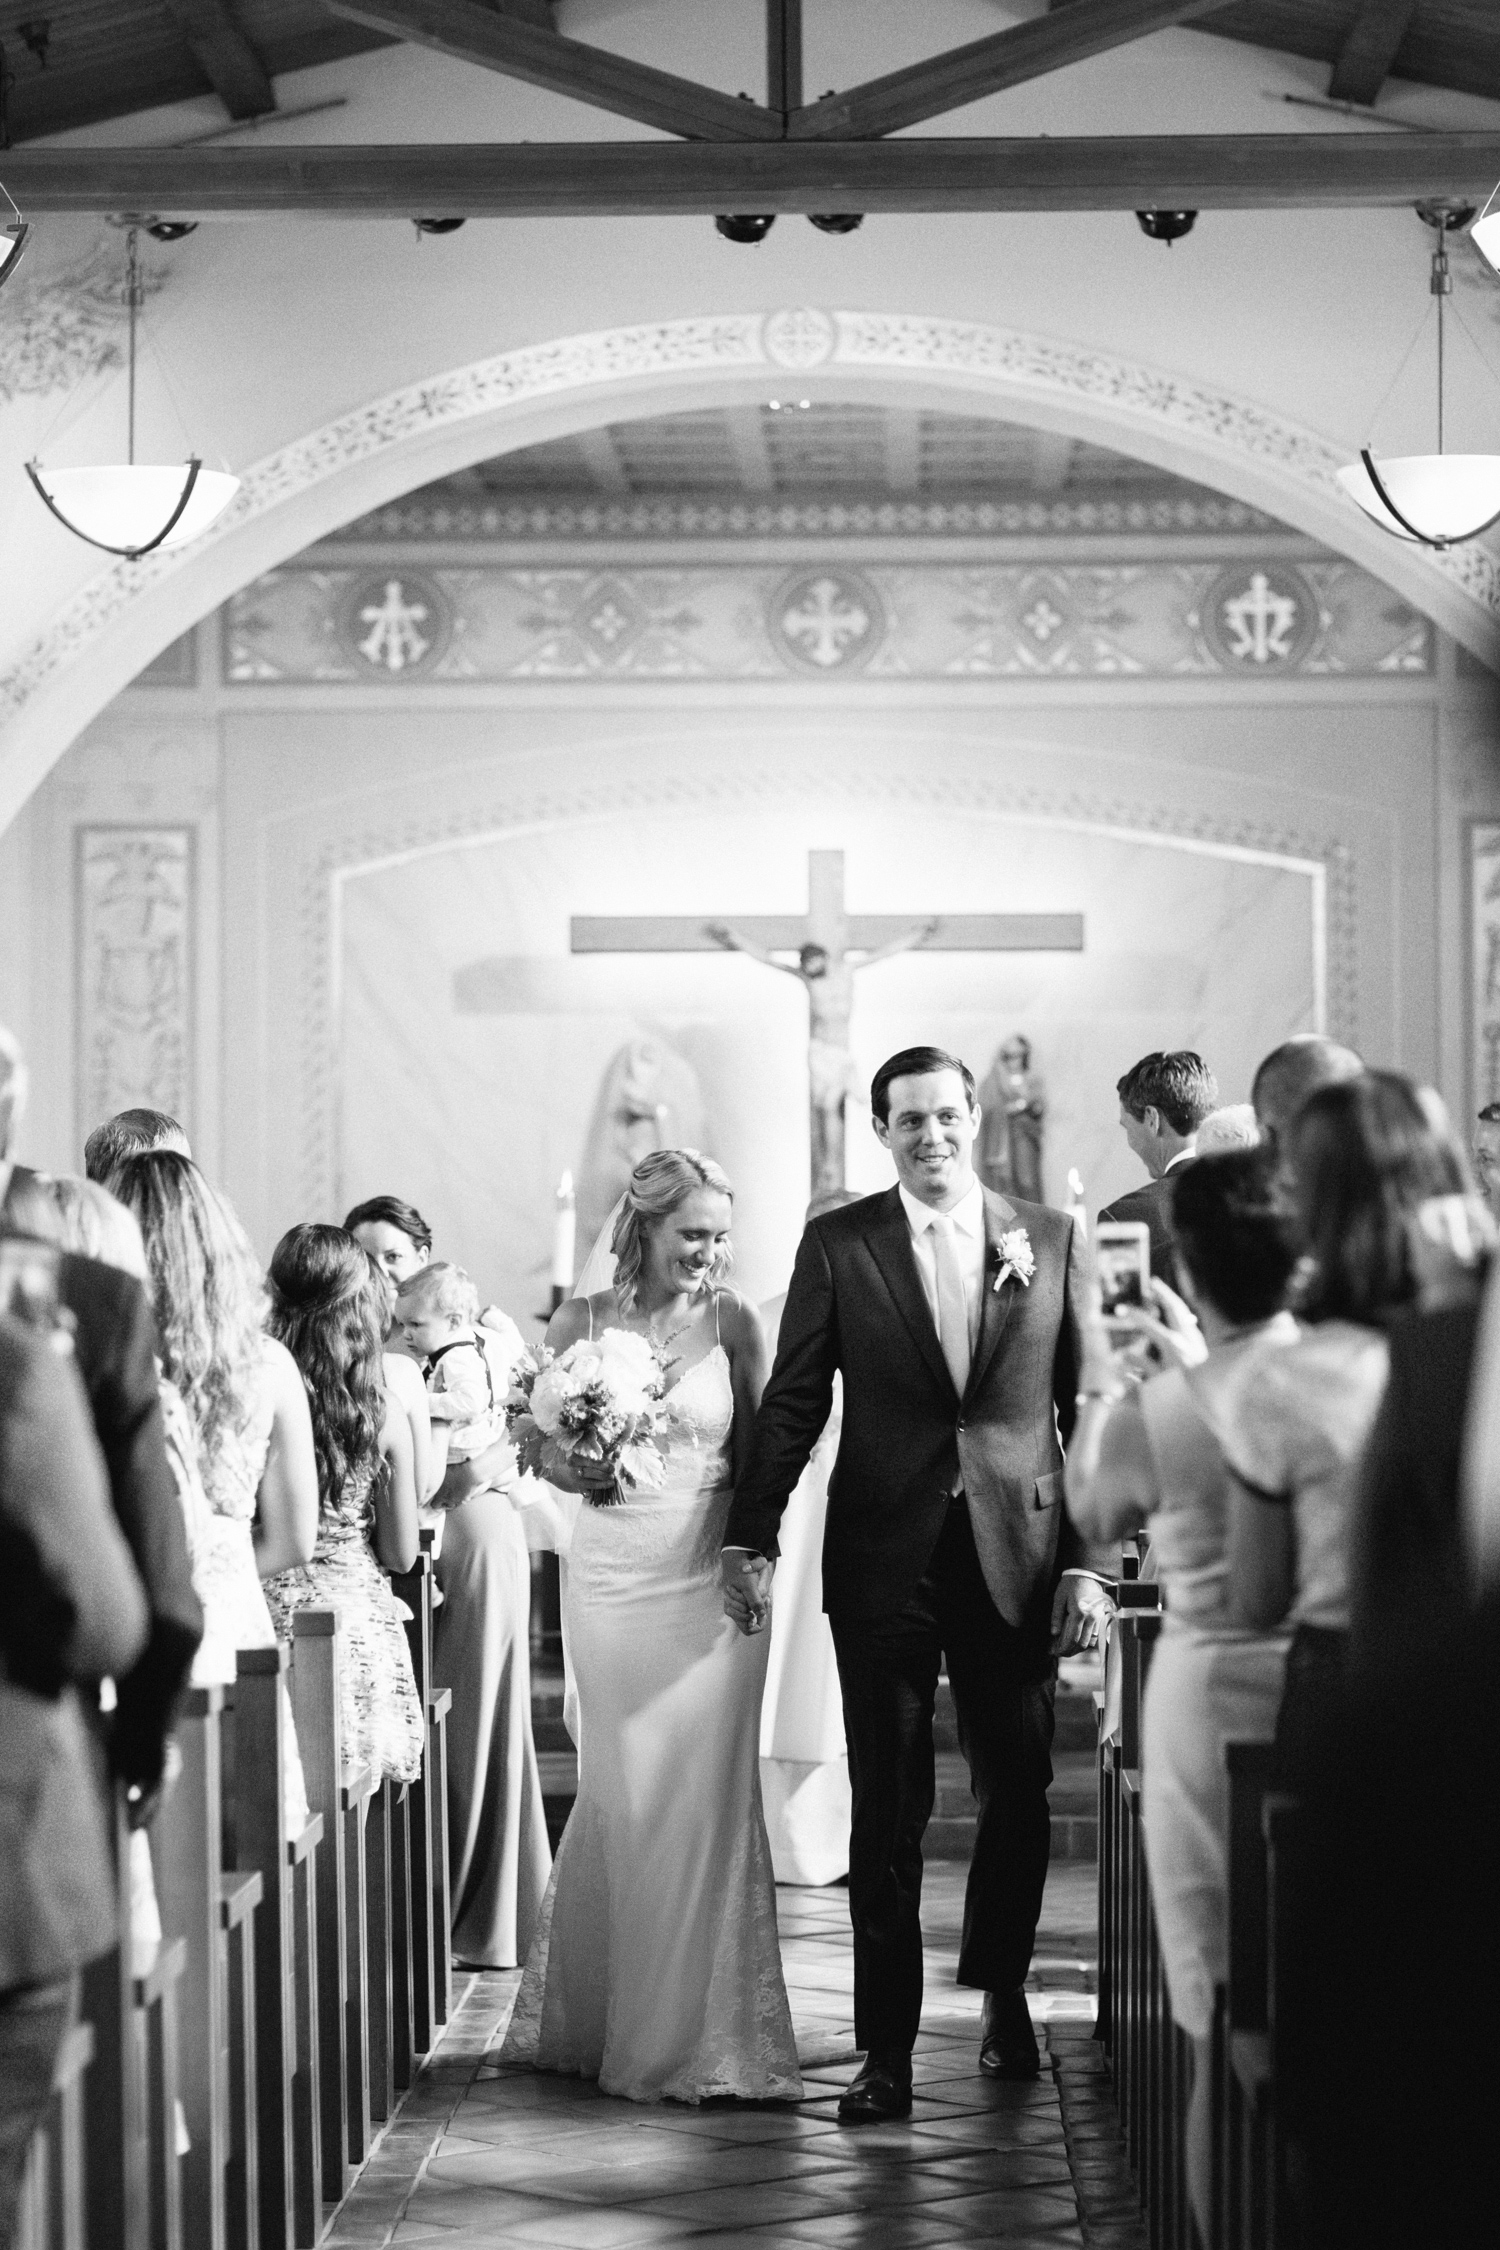 053-Jen-Wojcik-Photography-San-Diego-Wedding-Photographer.jpg